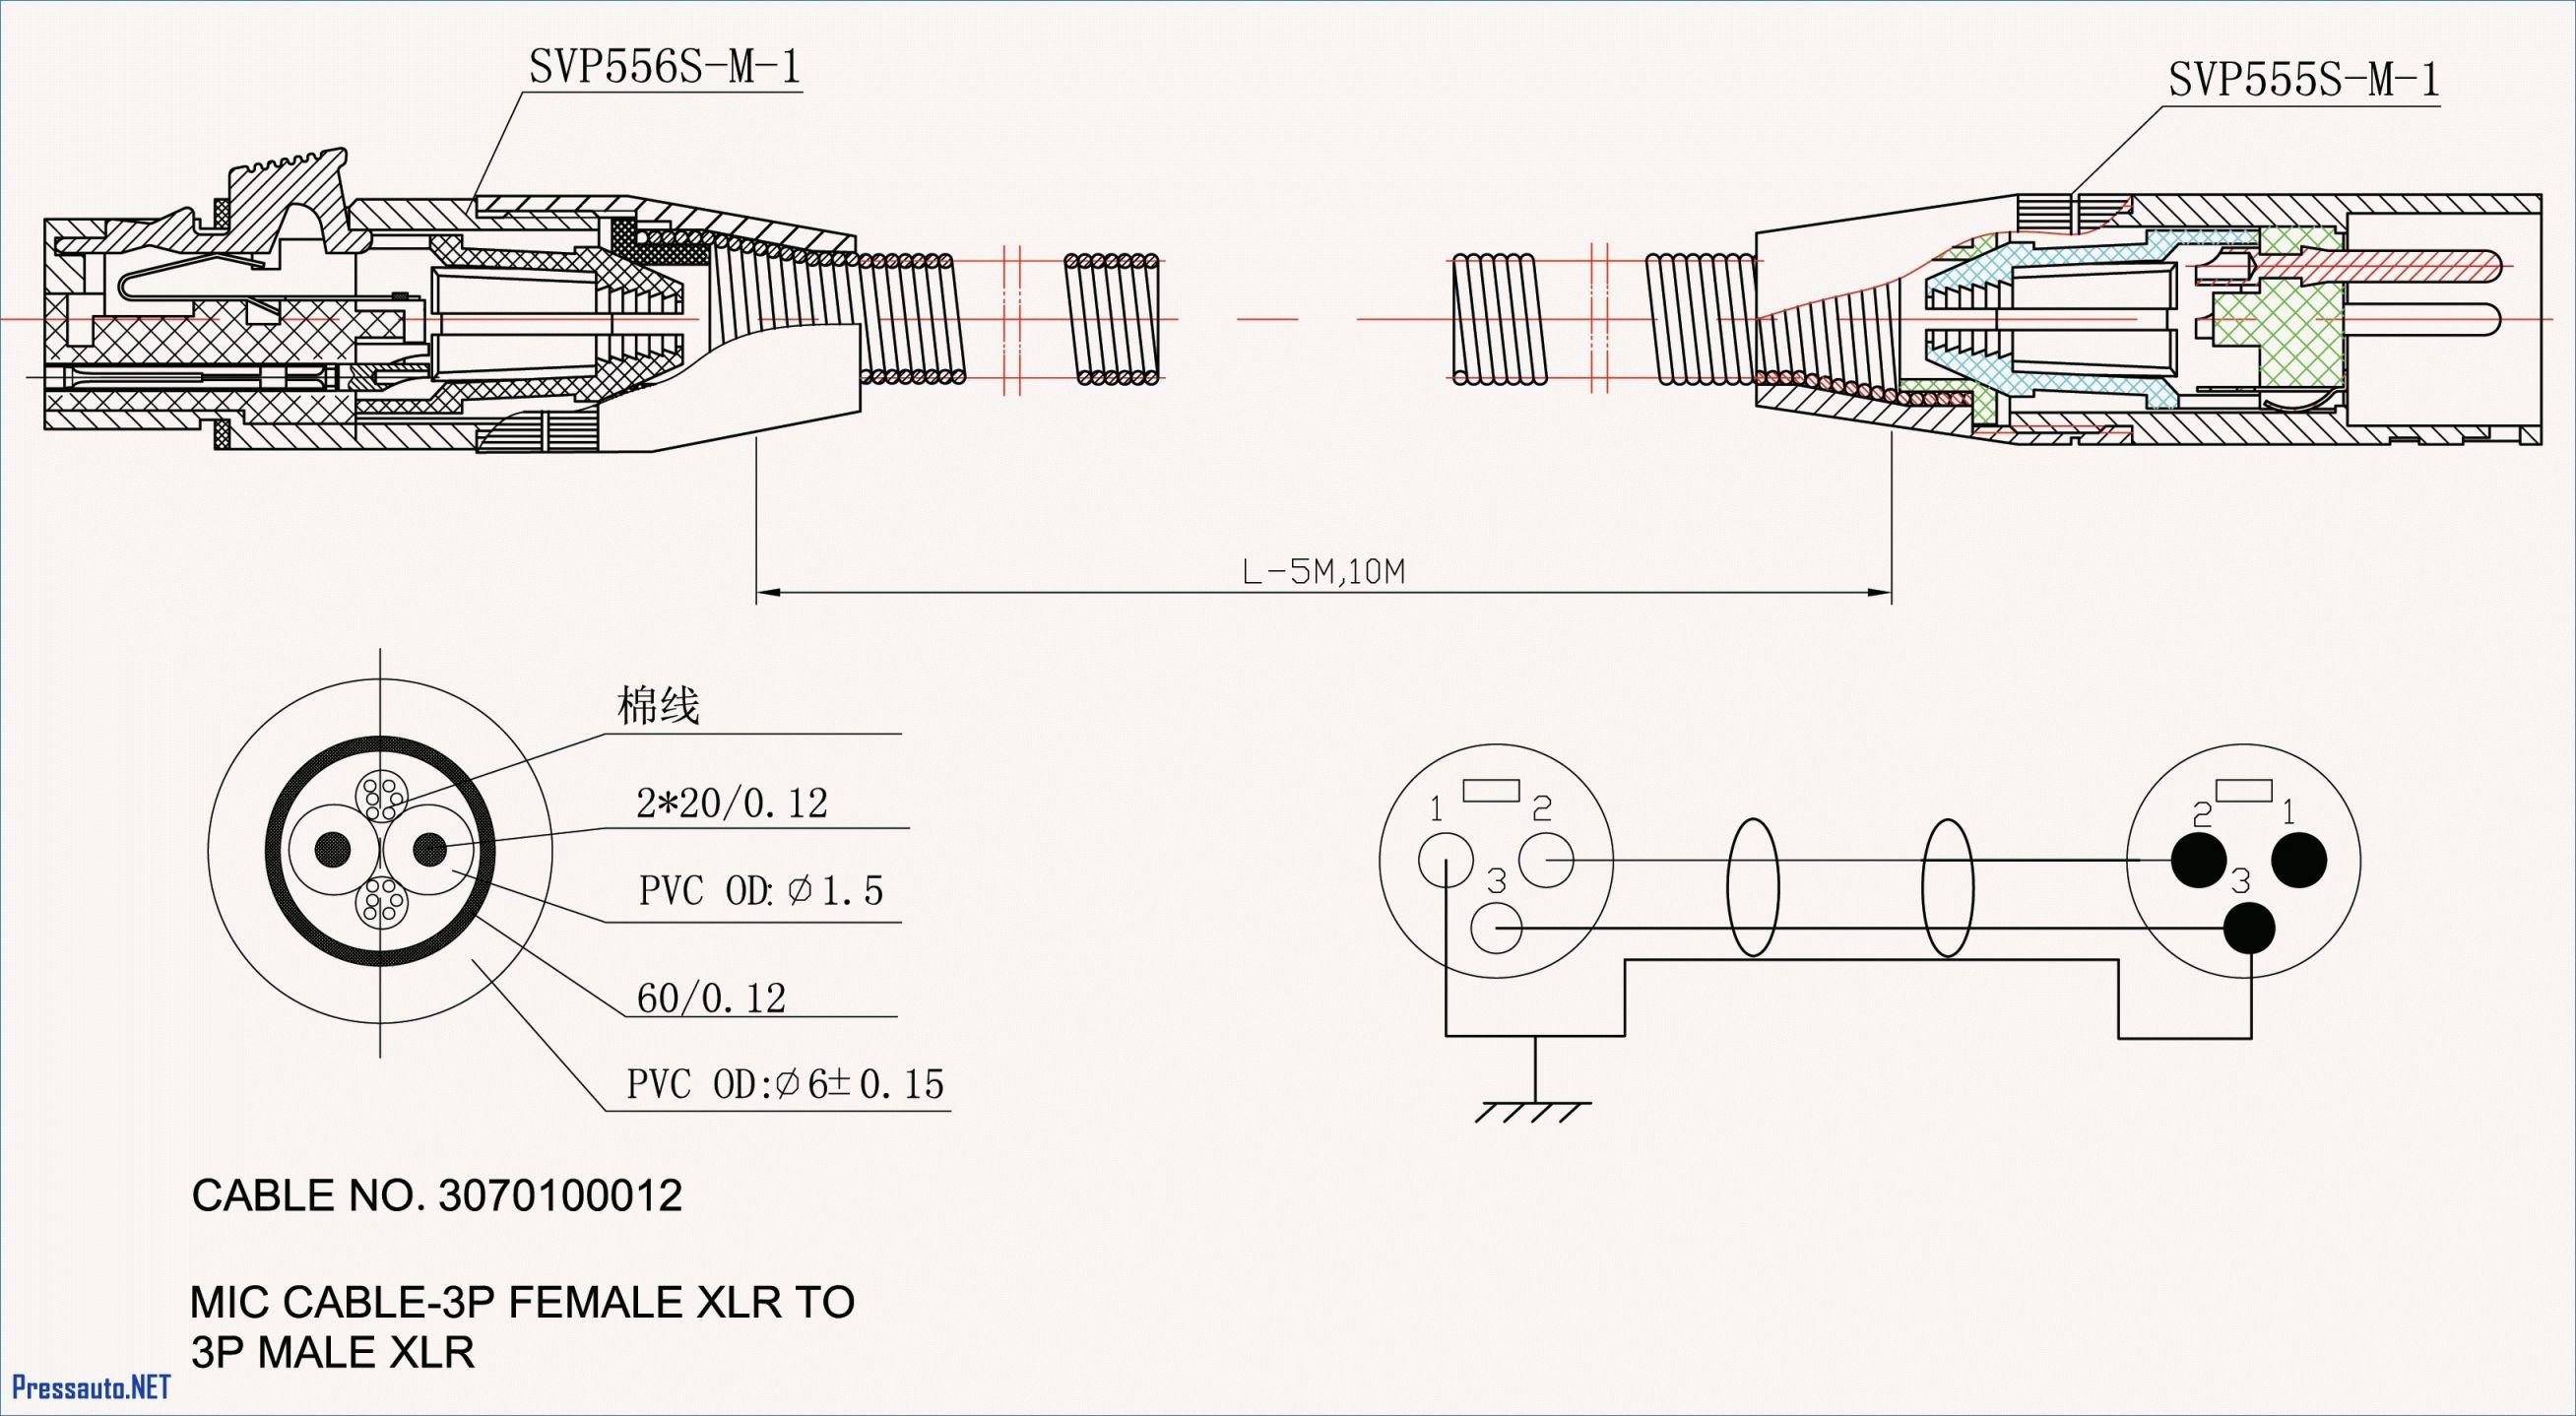 Single Wire Alternator Wiring Diagram Fresh Gm 2 Wire Alternator Wiring Diagram Wiring Diagram Of Single Wire Alternator Wiring Diagram